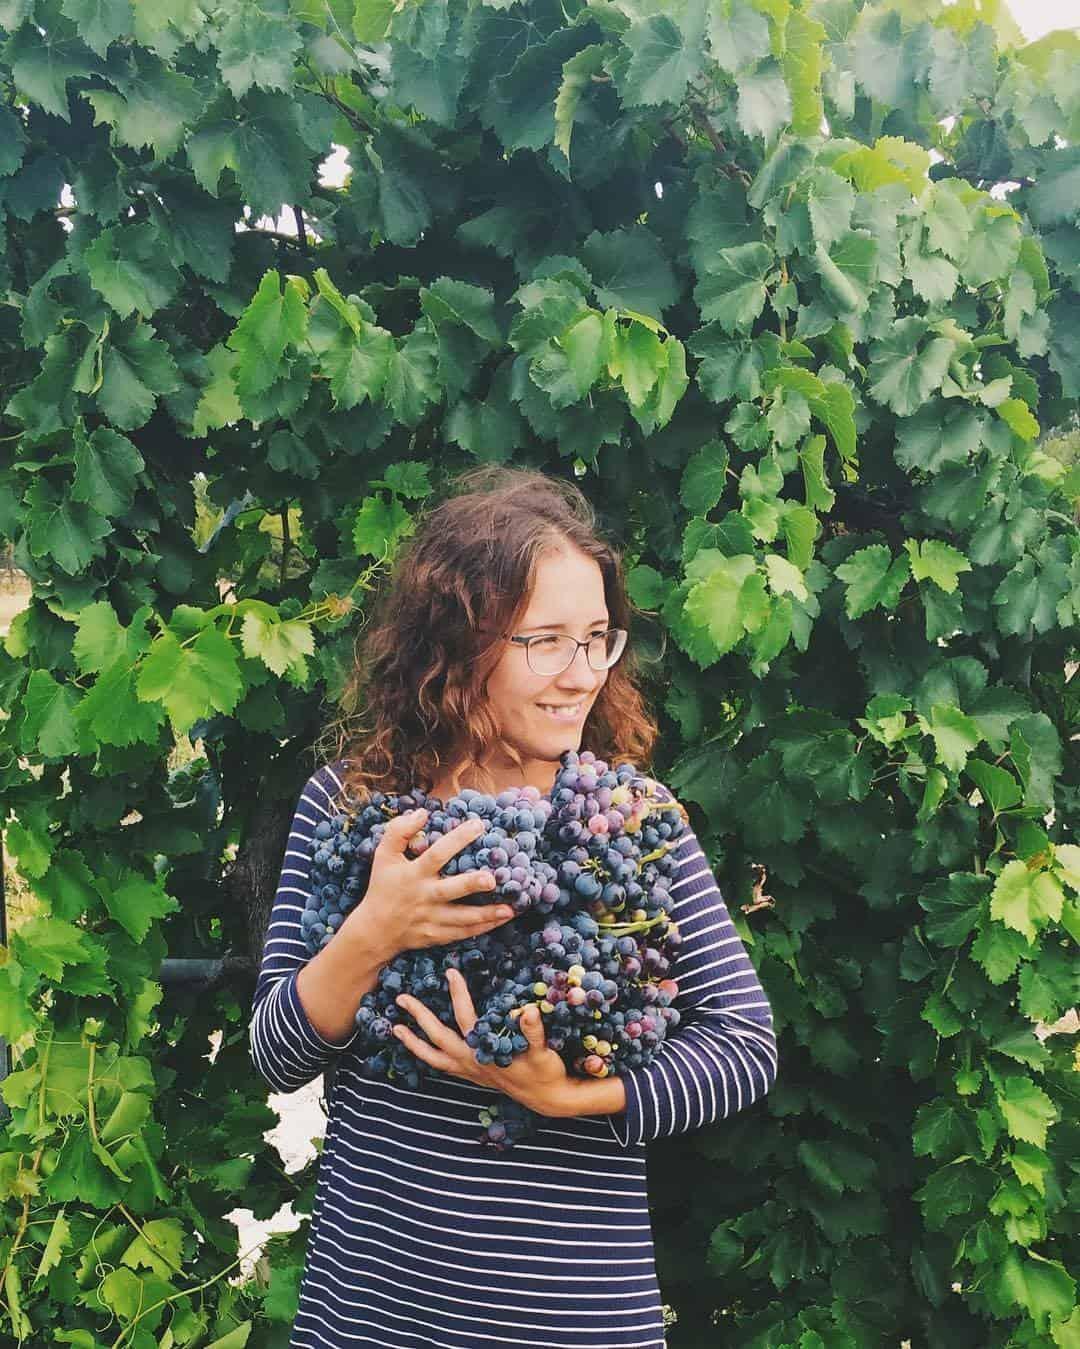 Audio interview - Jess Pilton